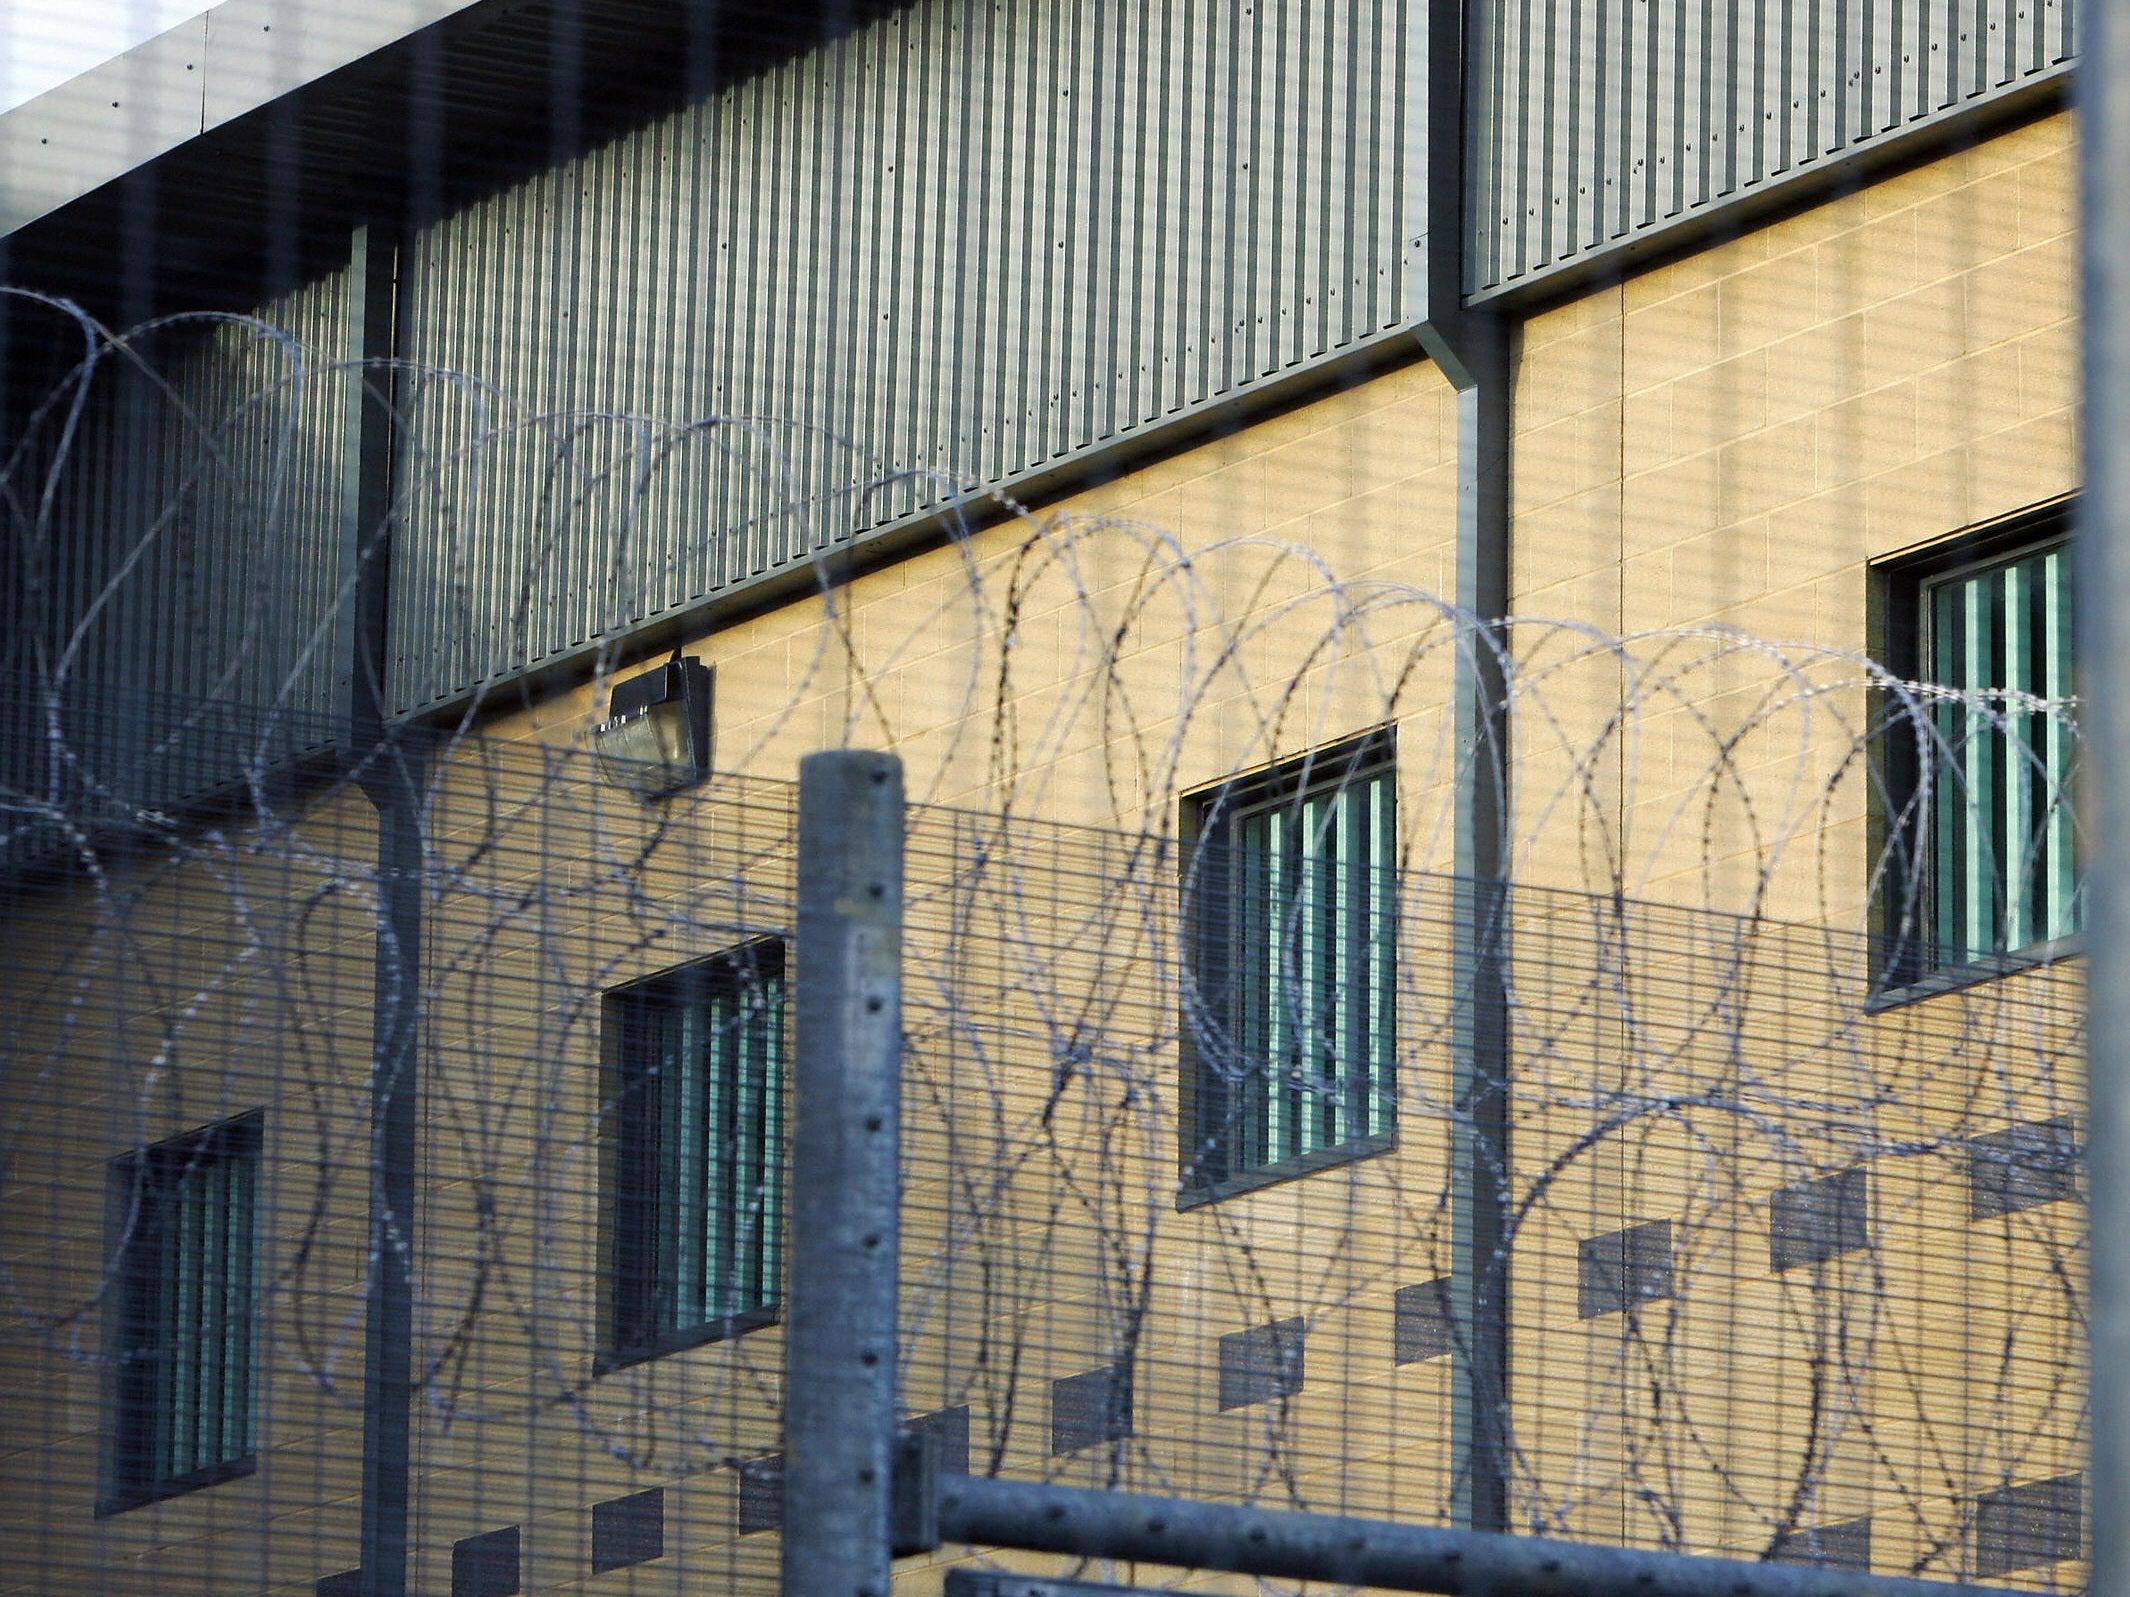 'I don't know why I'm still here': Hundreds held for deportation despite coronavirus travel ban